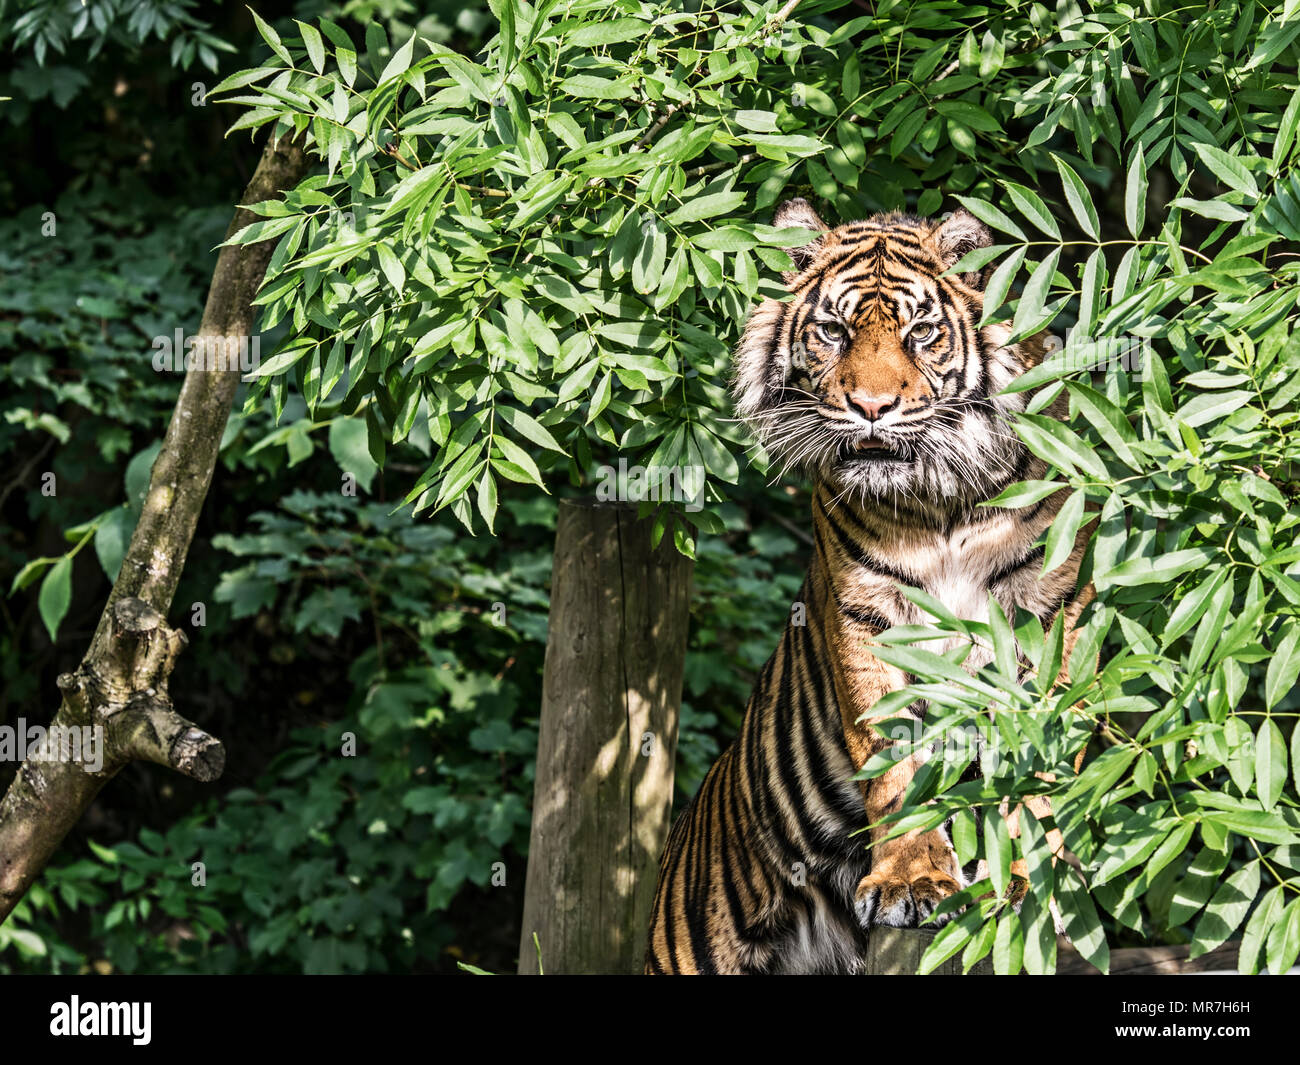 Tiger in a tree (caplivity) Stock Photo